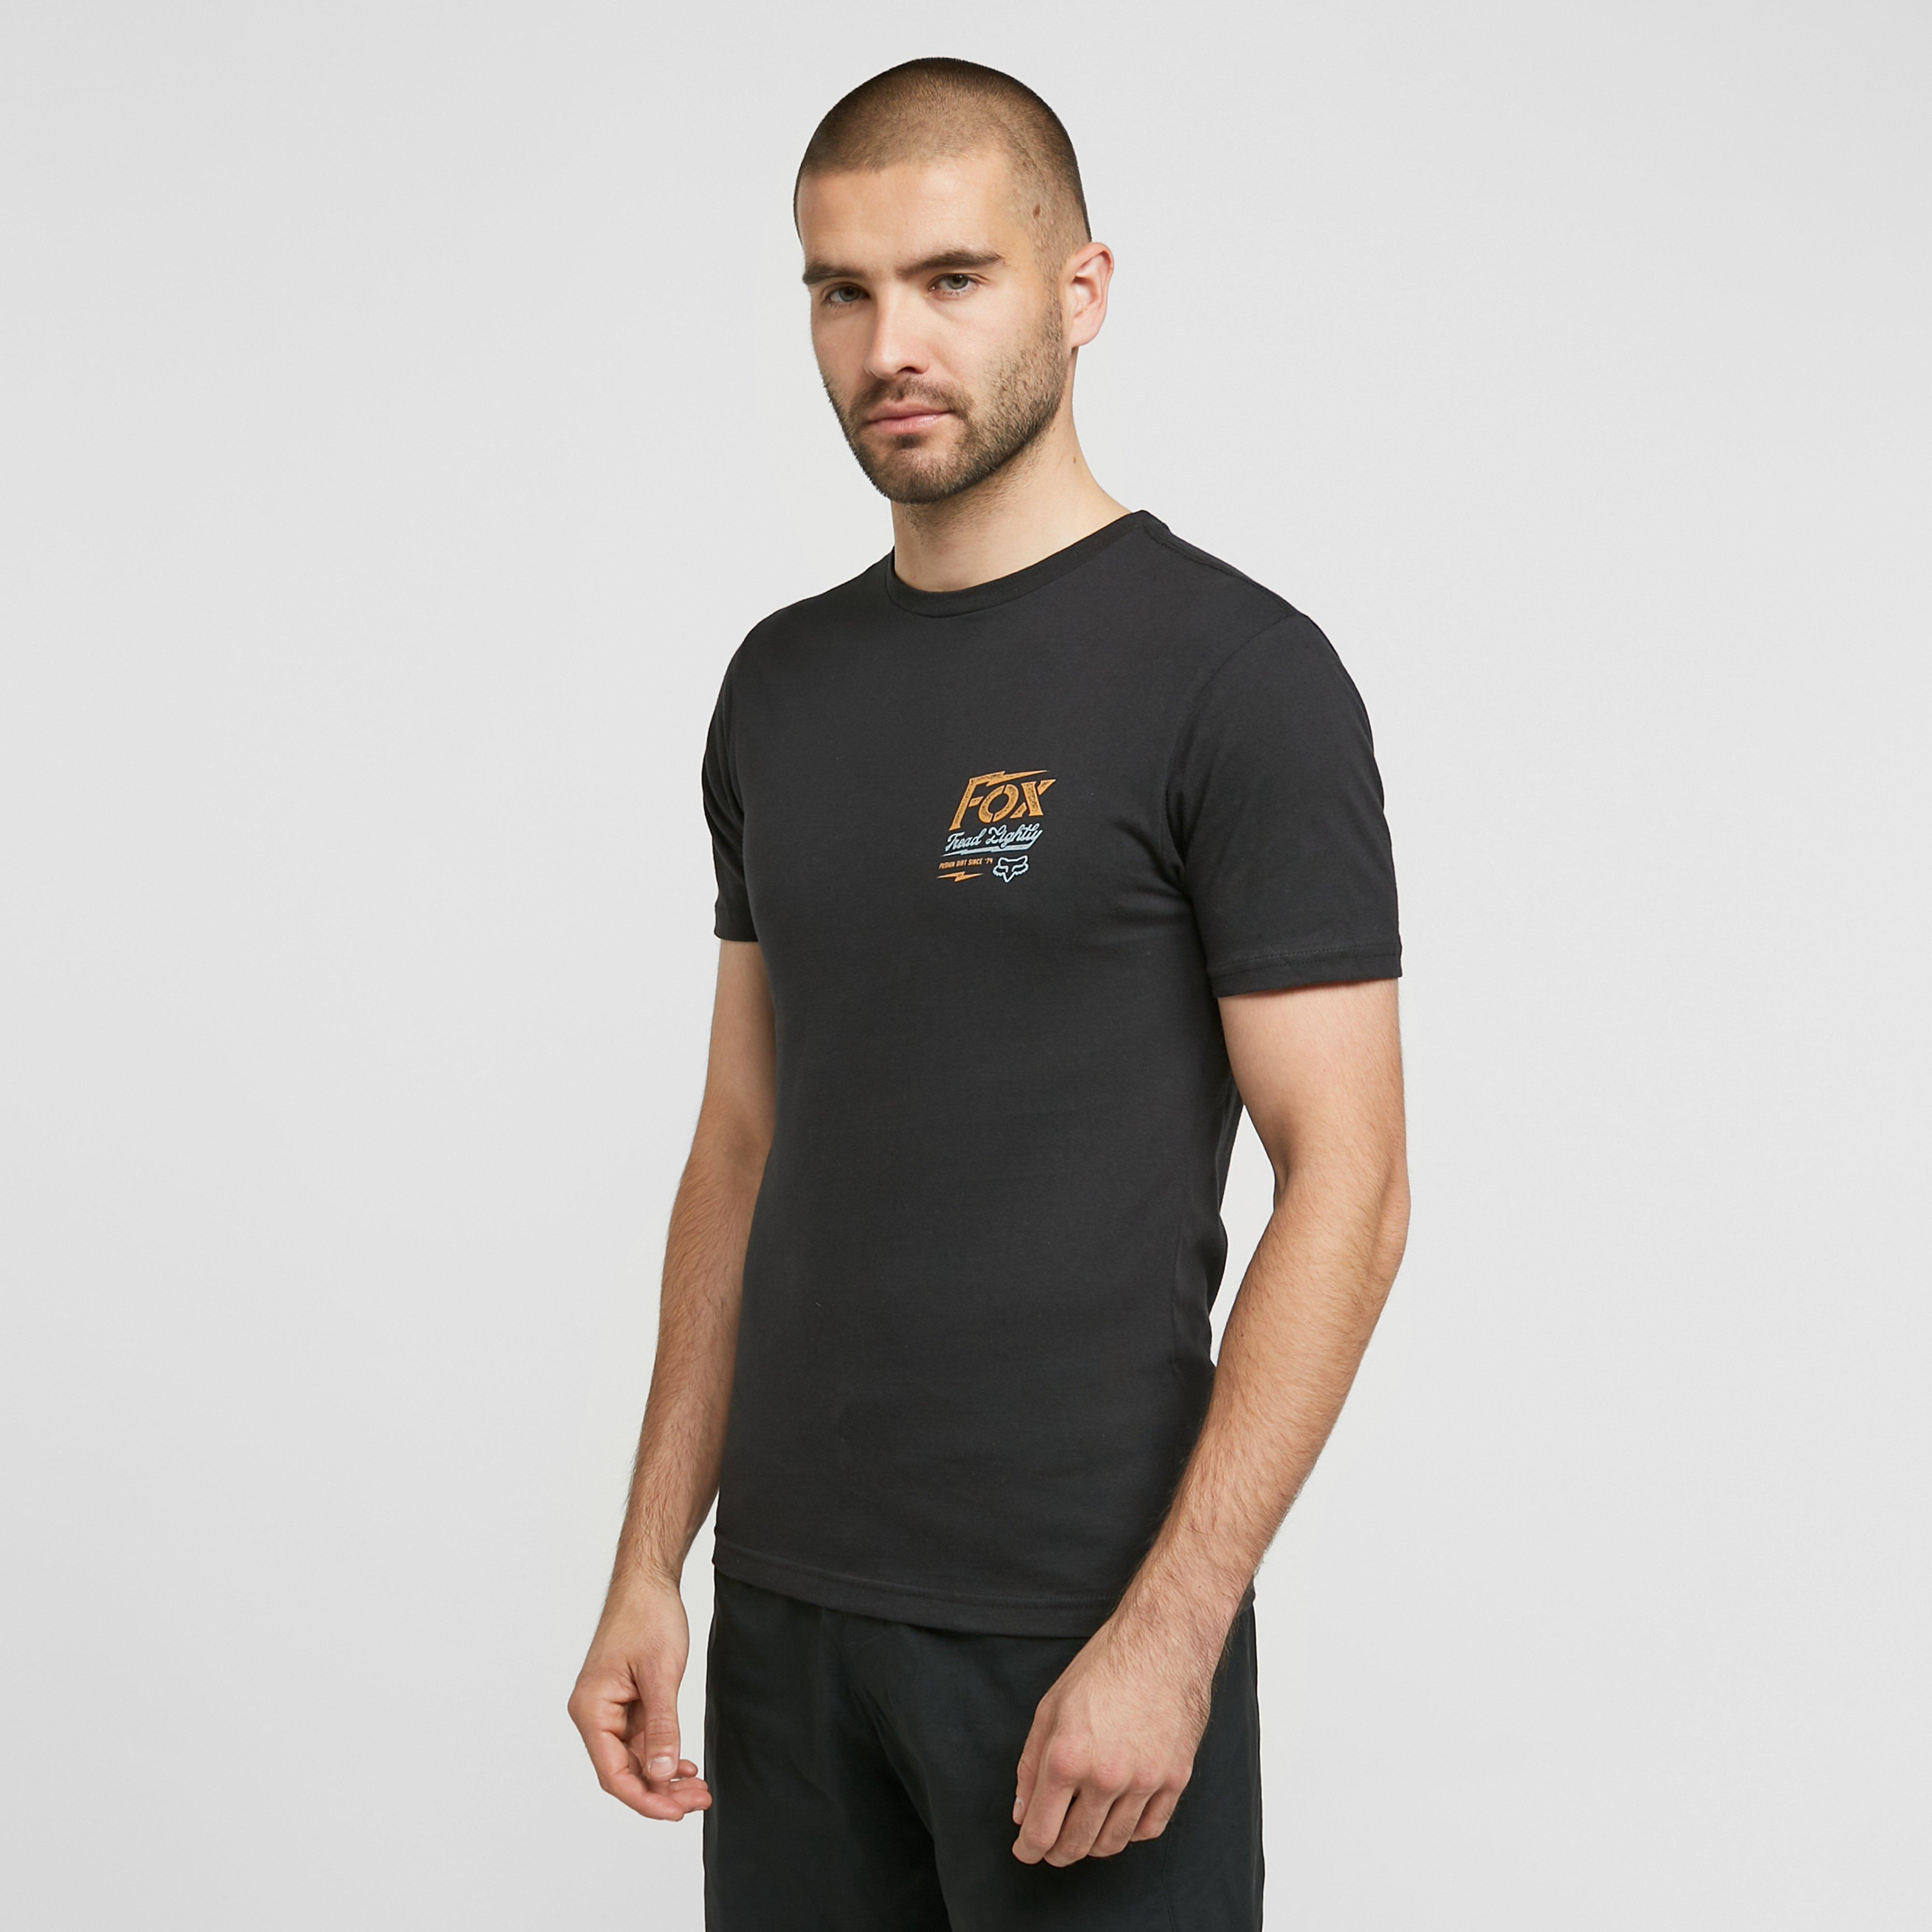 Image of Fox Men's Pushin Dirt T-Shirt - Black/Black, BLACK/BLACK